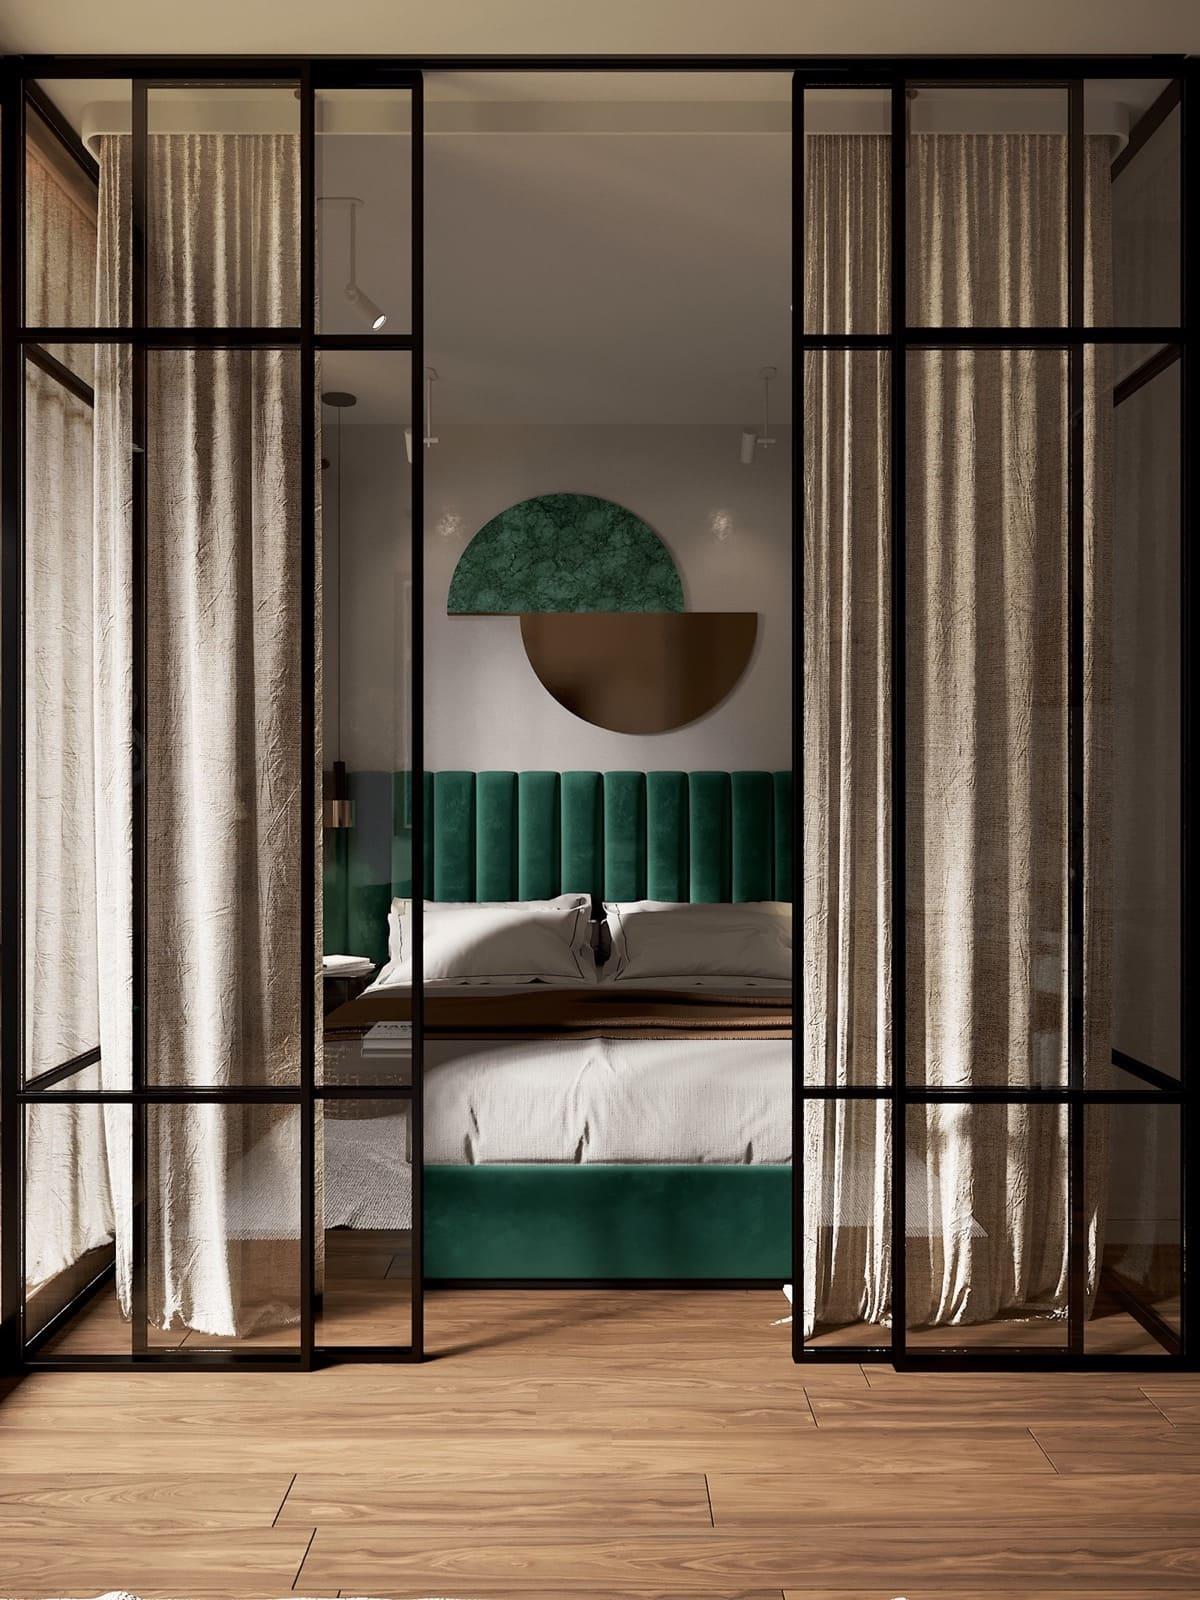 дизайн интерьера модной квартиры фото 67